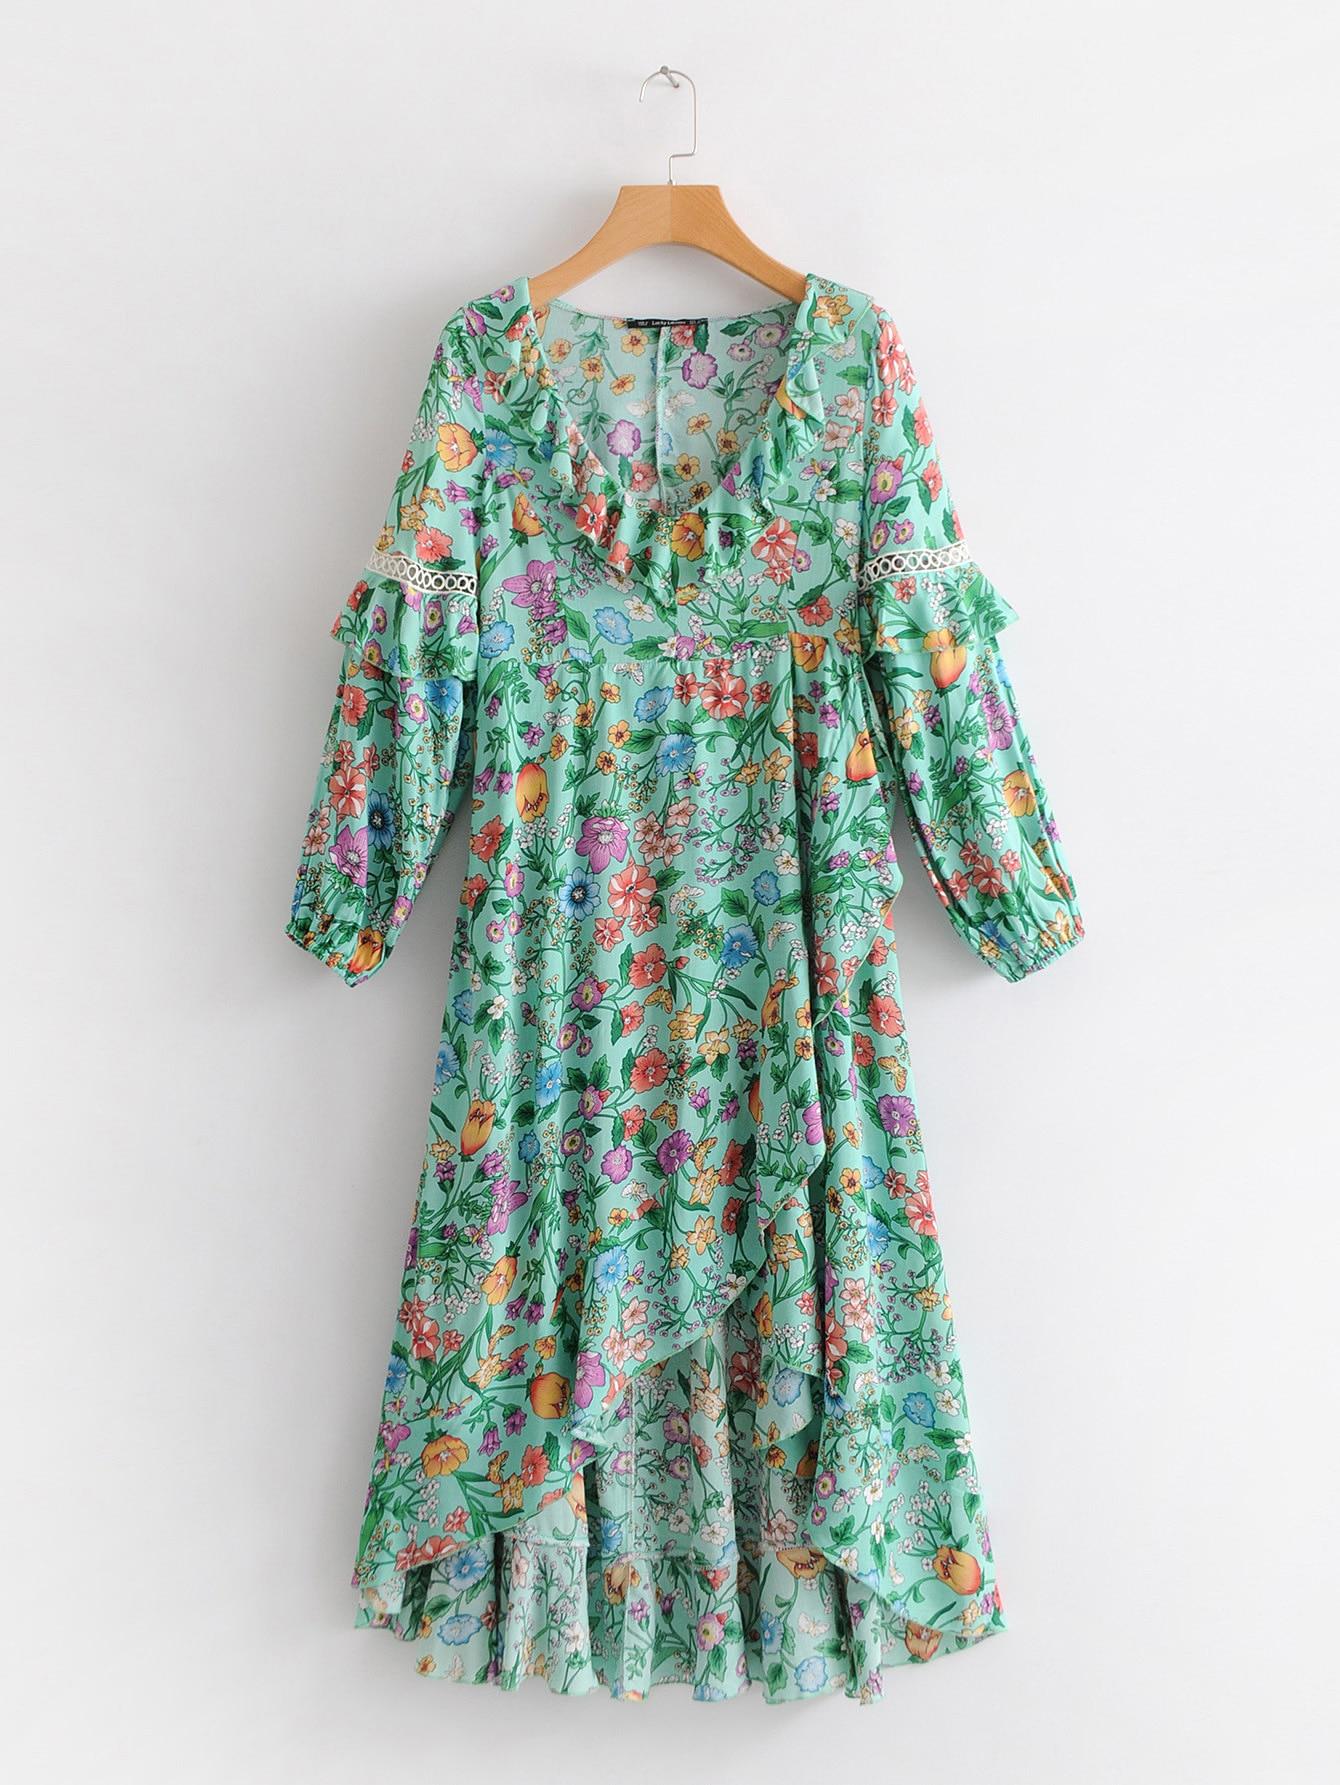 a4cb2e5e0d3c Vestido de flores con volantes vestido Midi bohemio Chic para mujer Vestido  de playa con volantes dobladillo vestido Hippie Vestidos de mujer